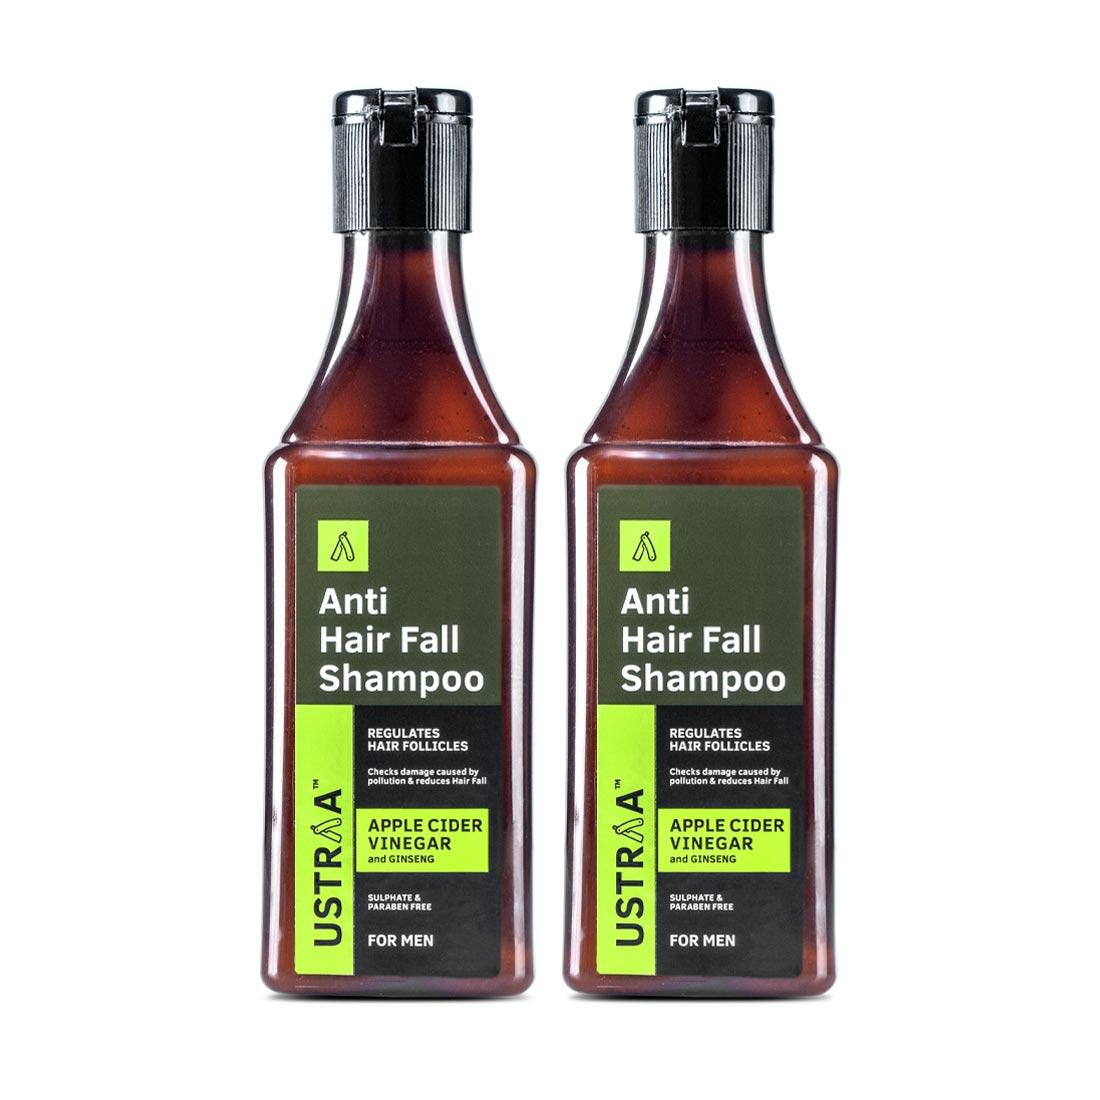 Anti Hair Fall Shampoo with Apple Cider Vinegar - Set of 2